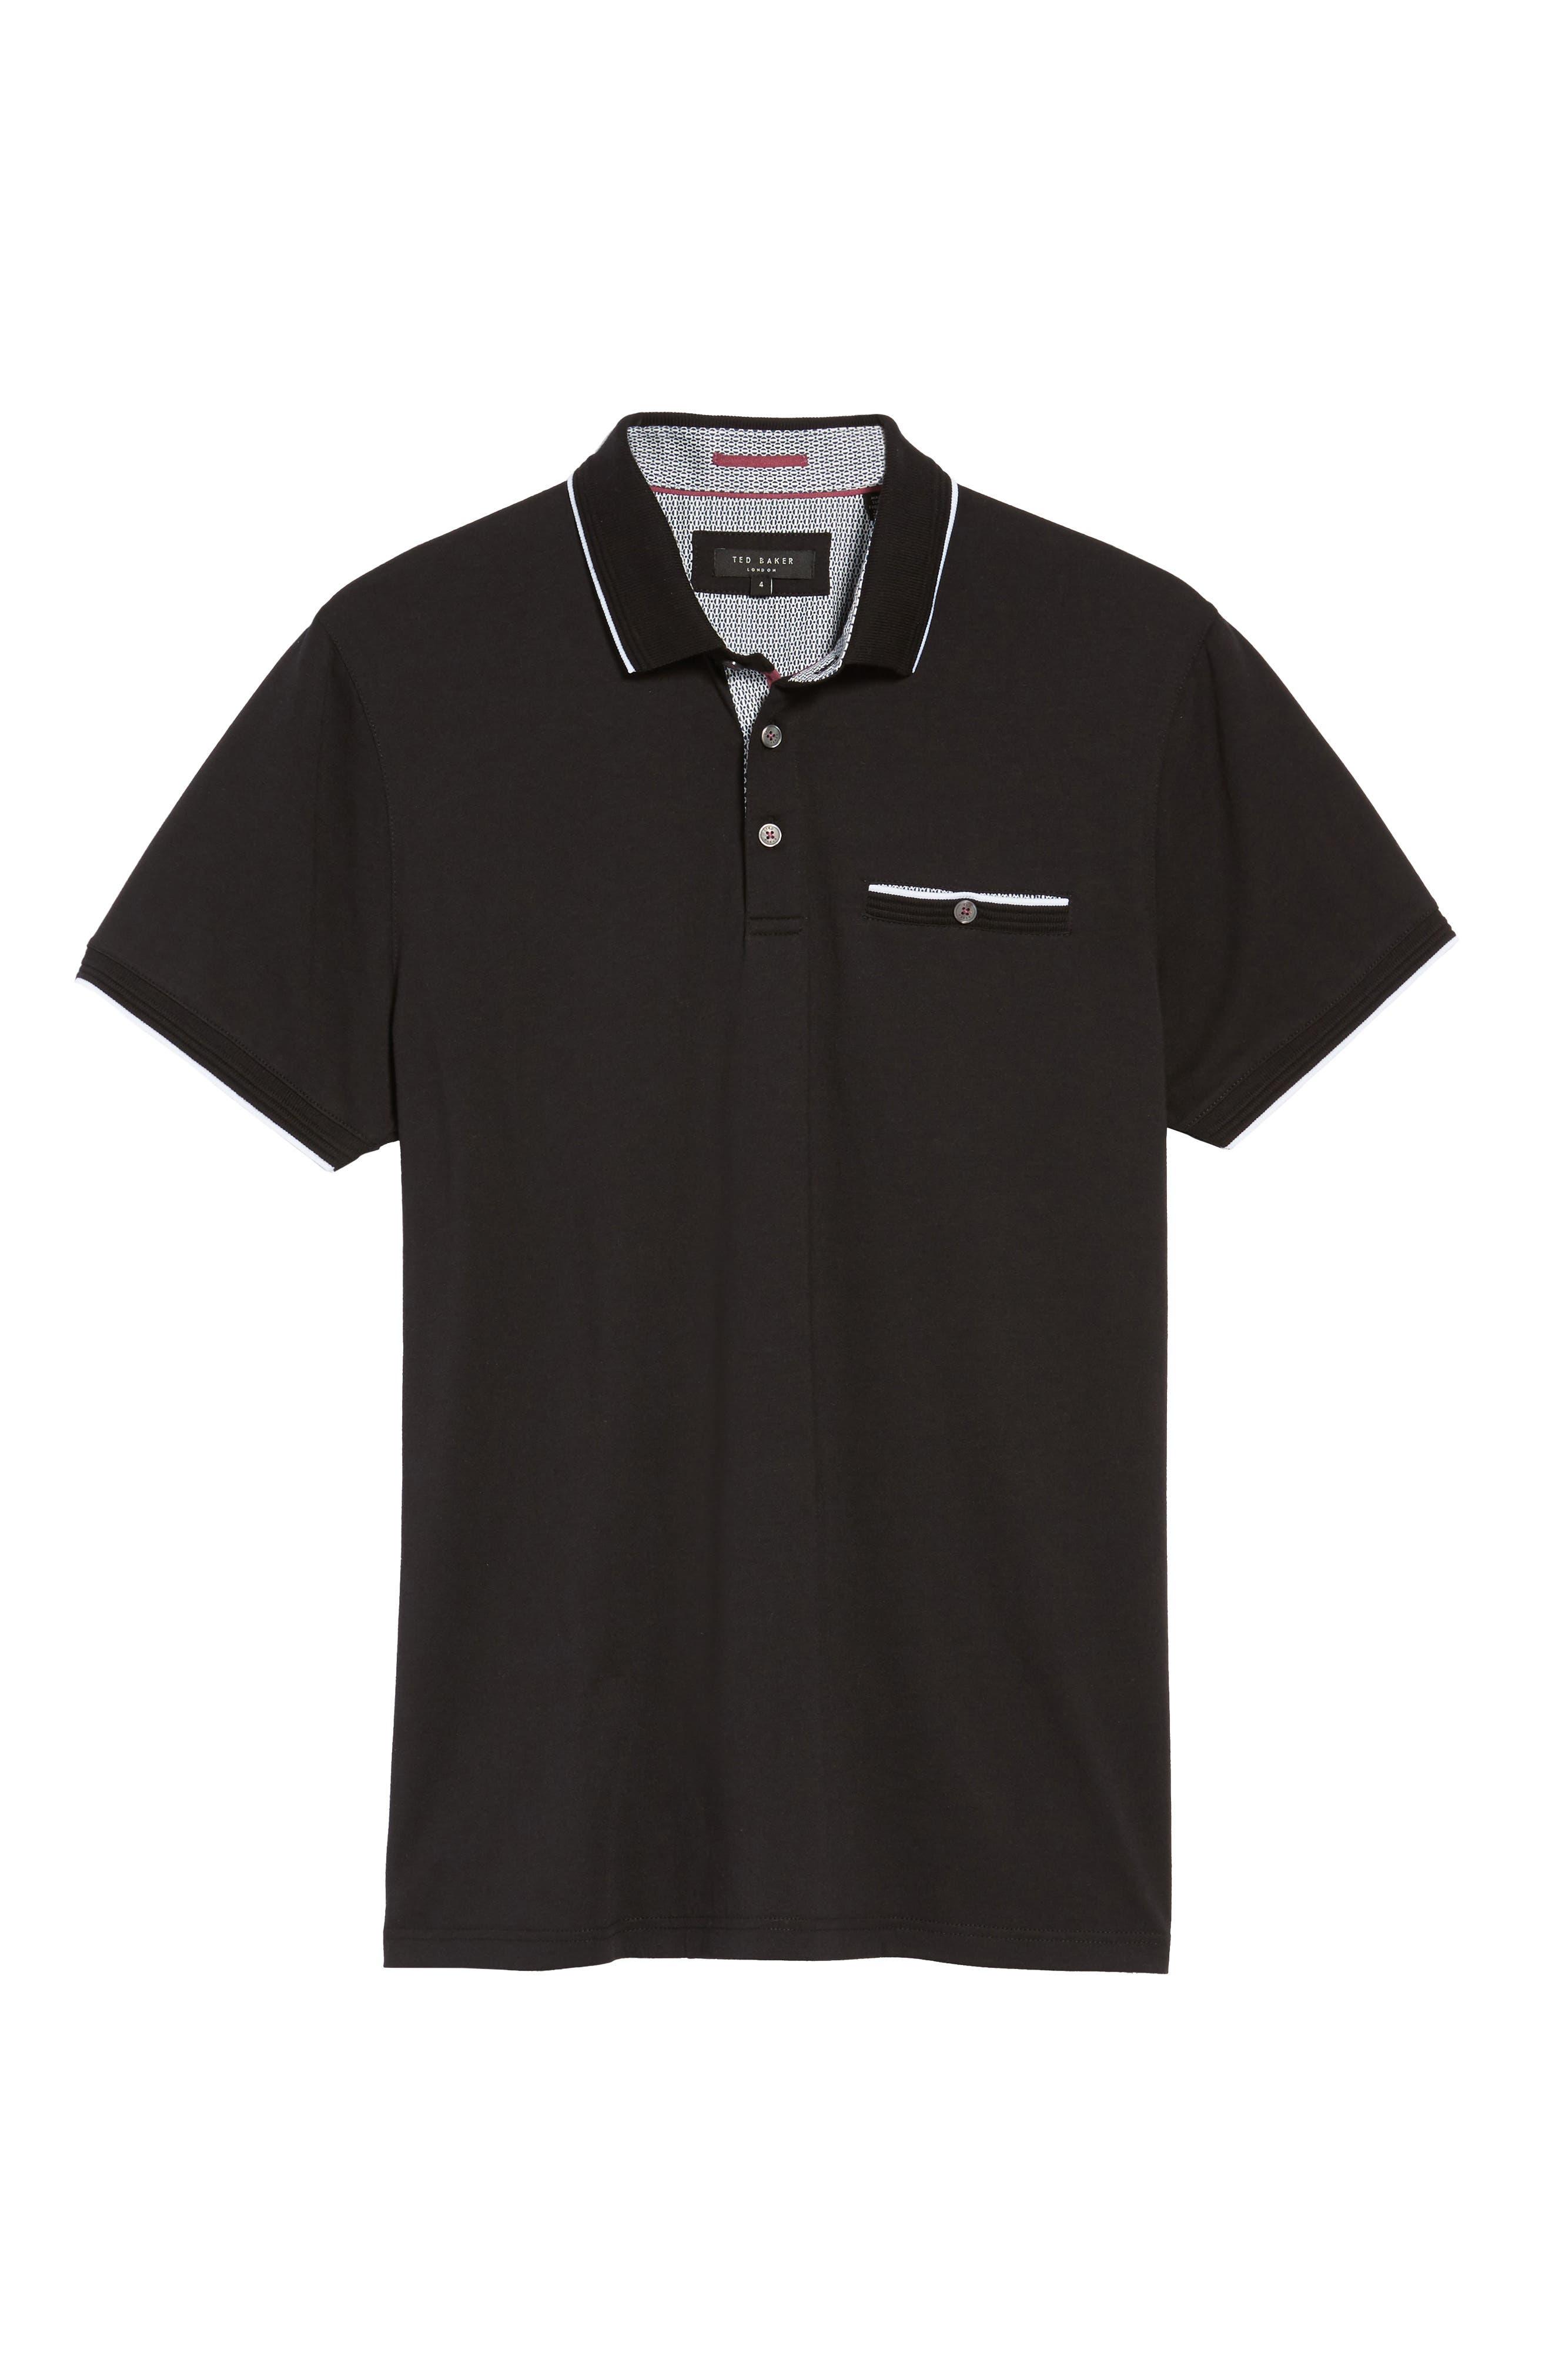 Derrytt Jersey Polo,                             Alternate thumbnail 6, color,                             001